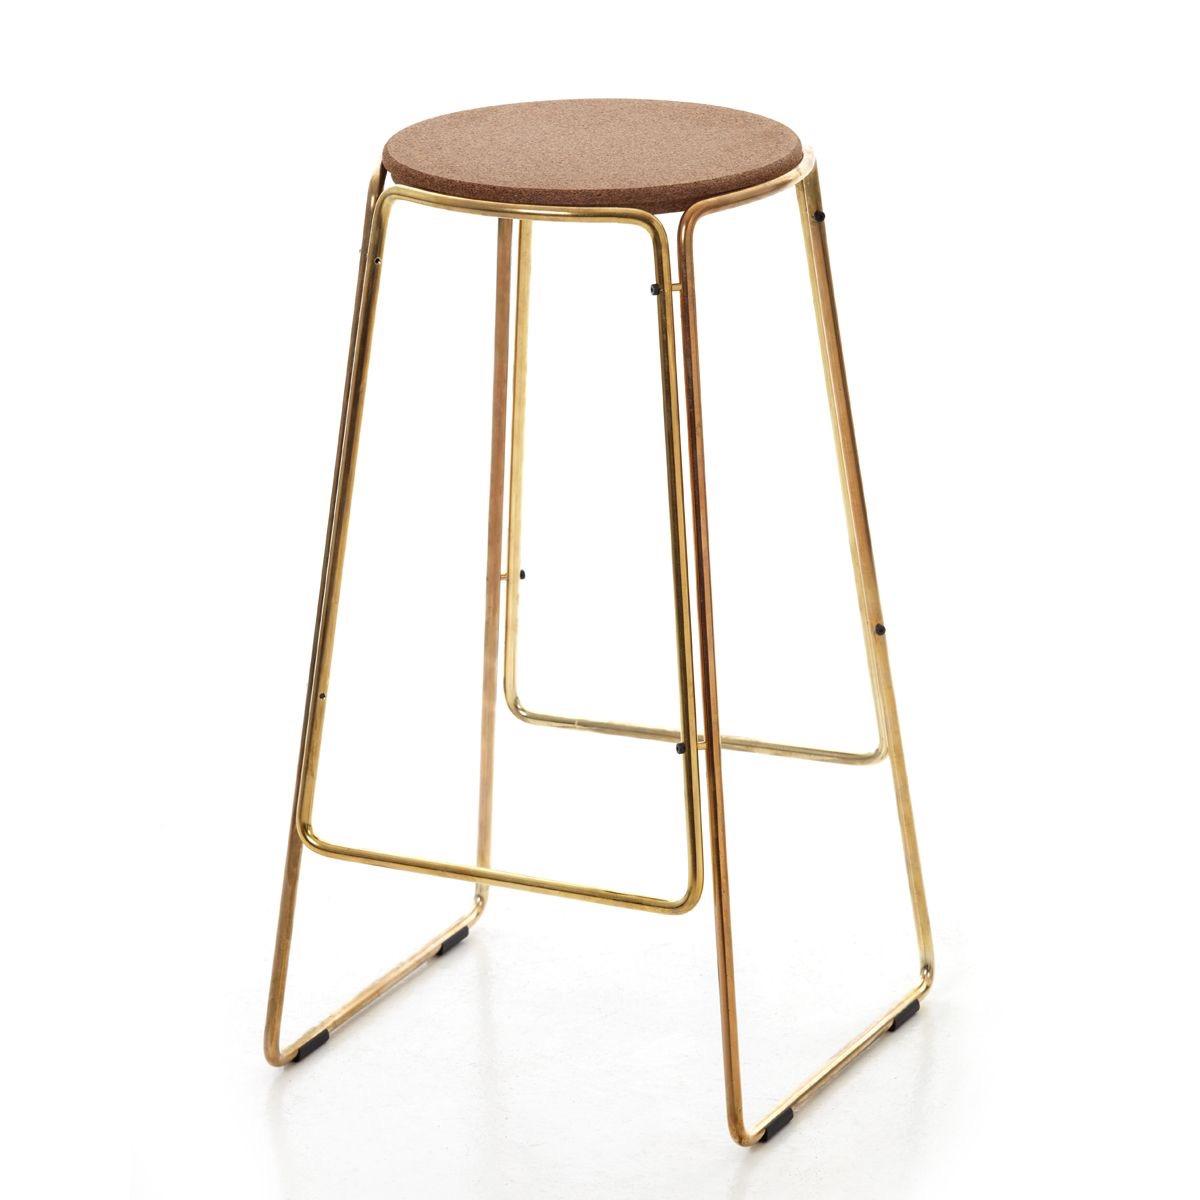 Groovy Find The Perfect Stool Uwap Interior Chair Design Uwaporg